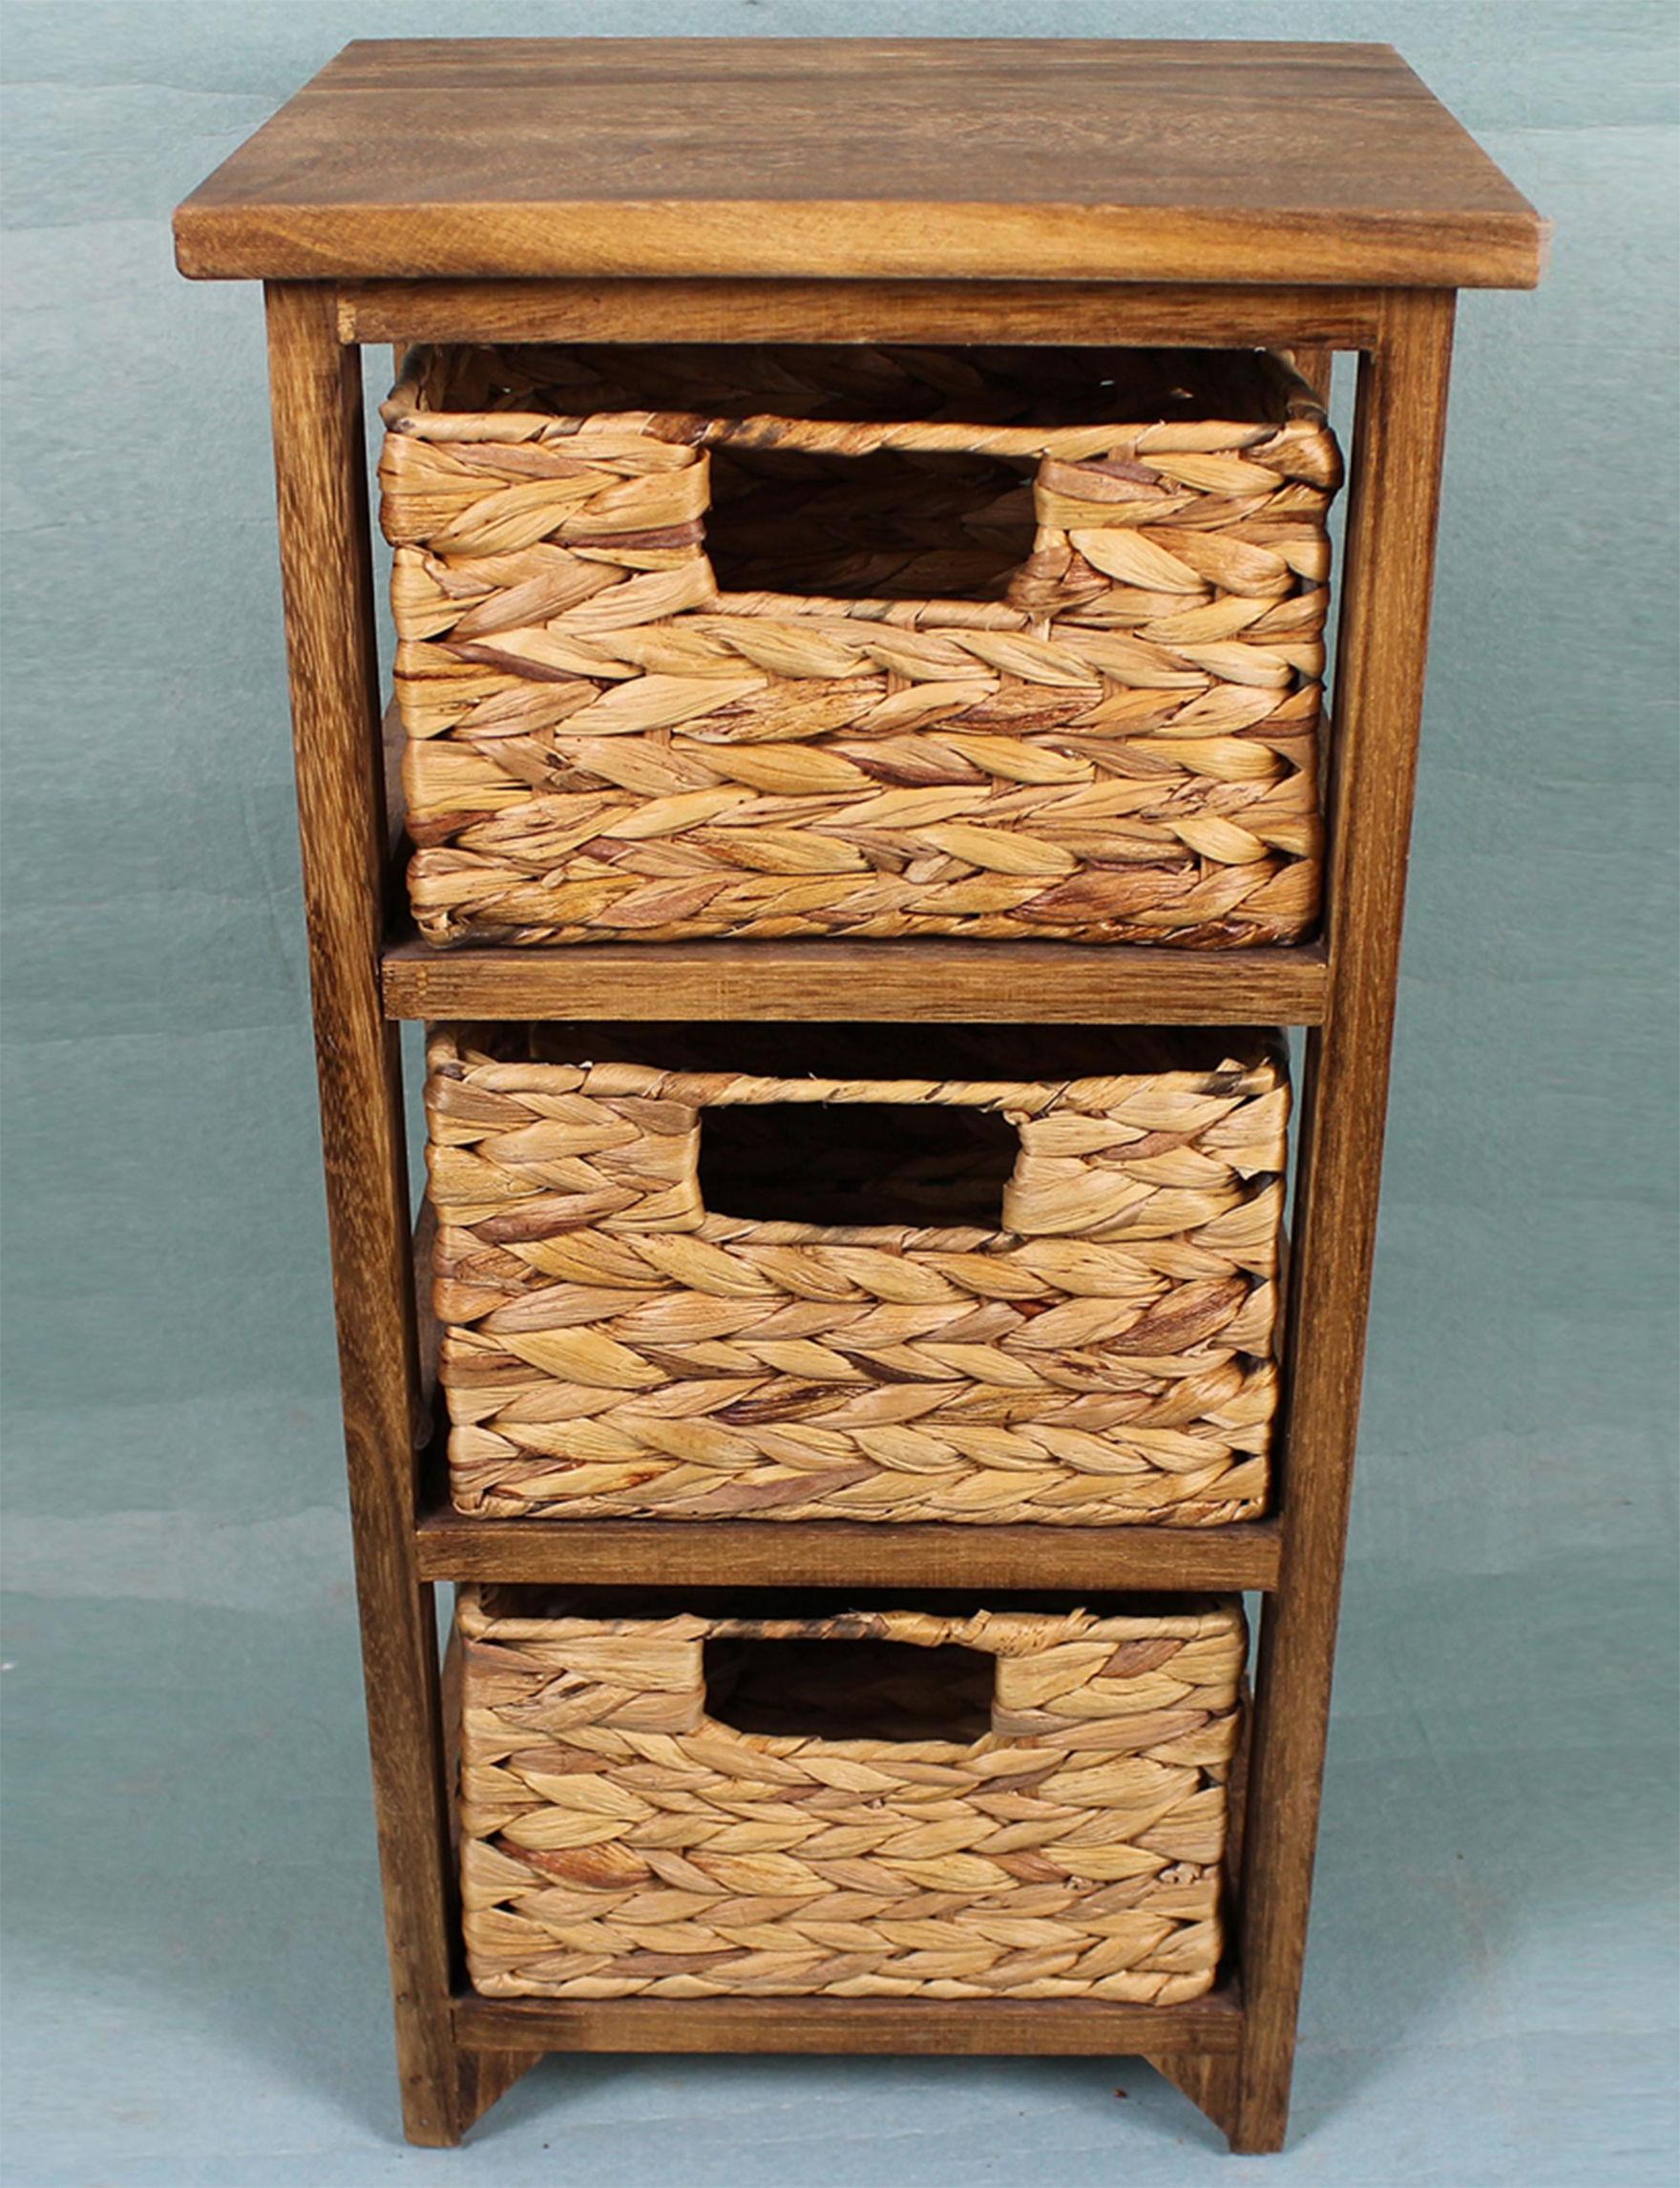 Designstyles Brown Cabinets & Cupboards Living Room Furniture Storage & Organization